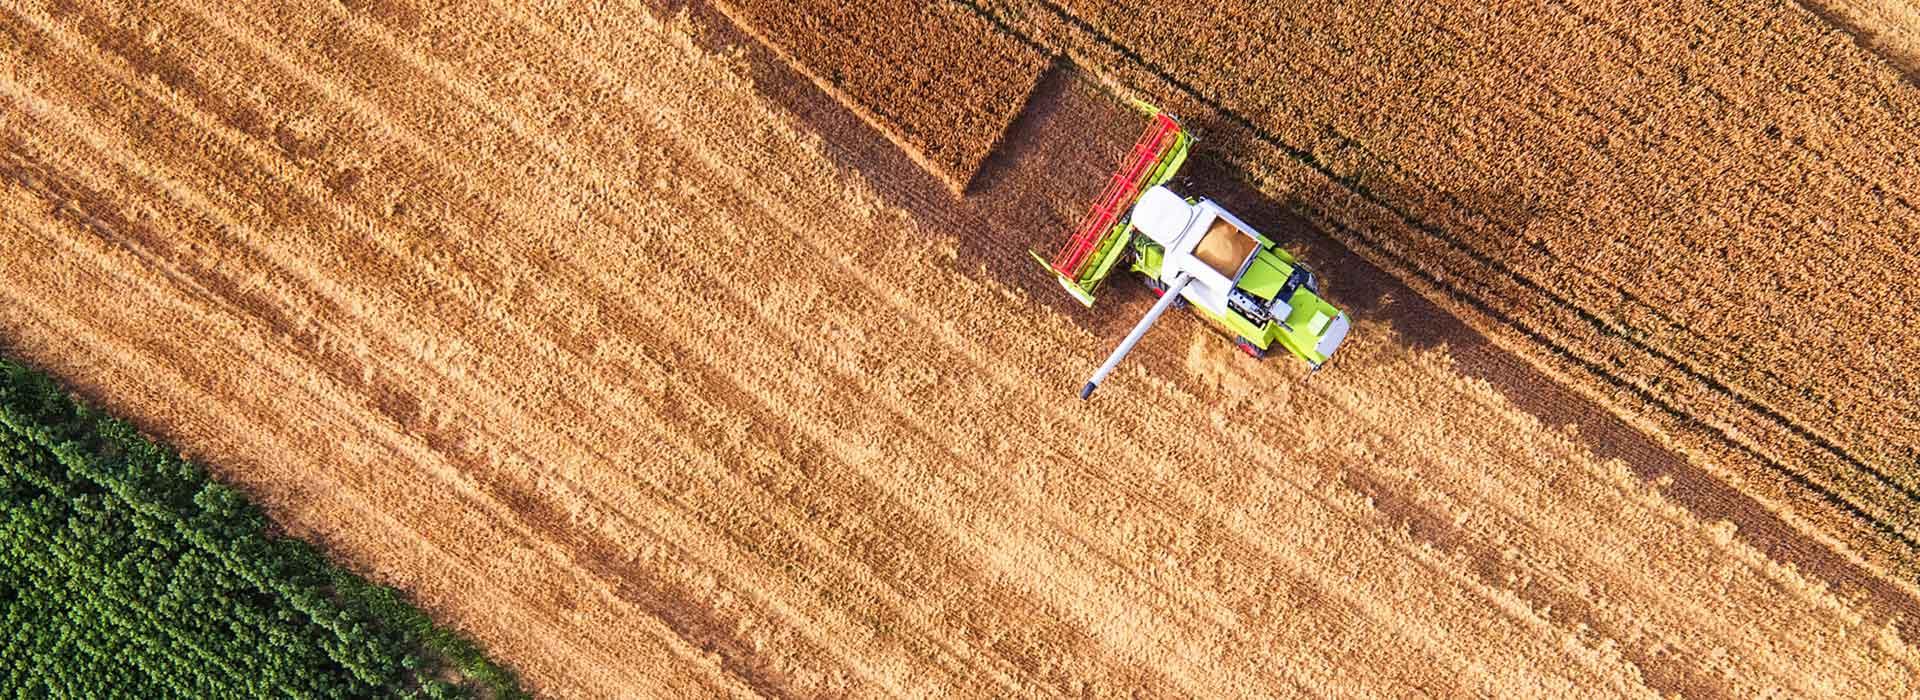 banner-aerial-combine.jpg